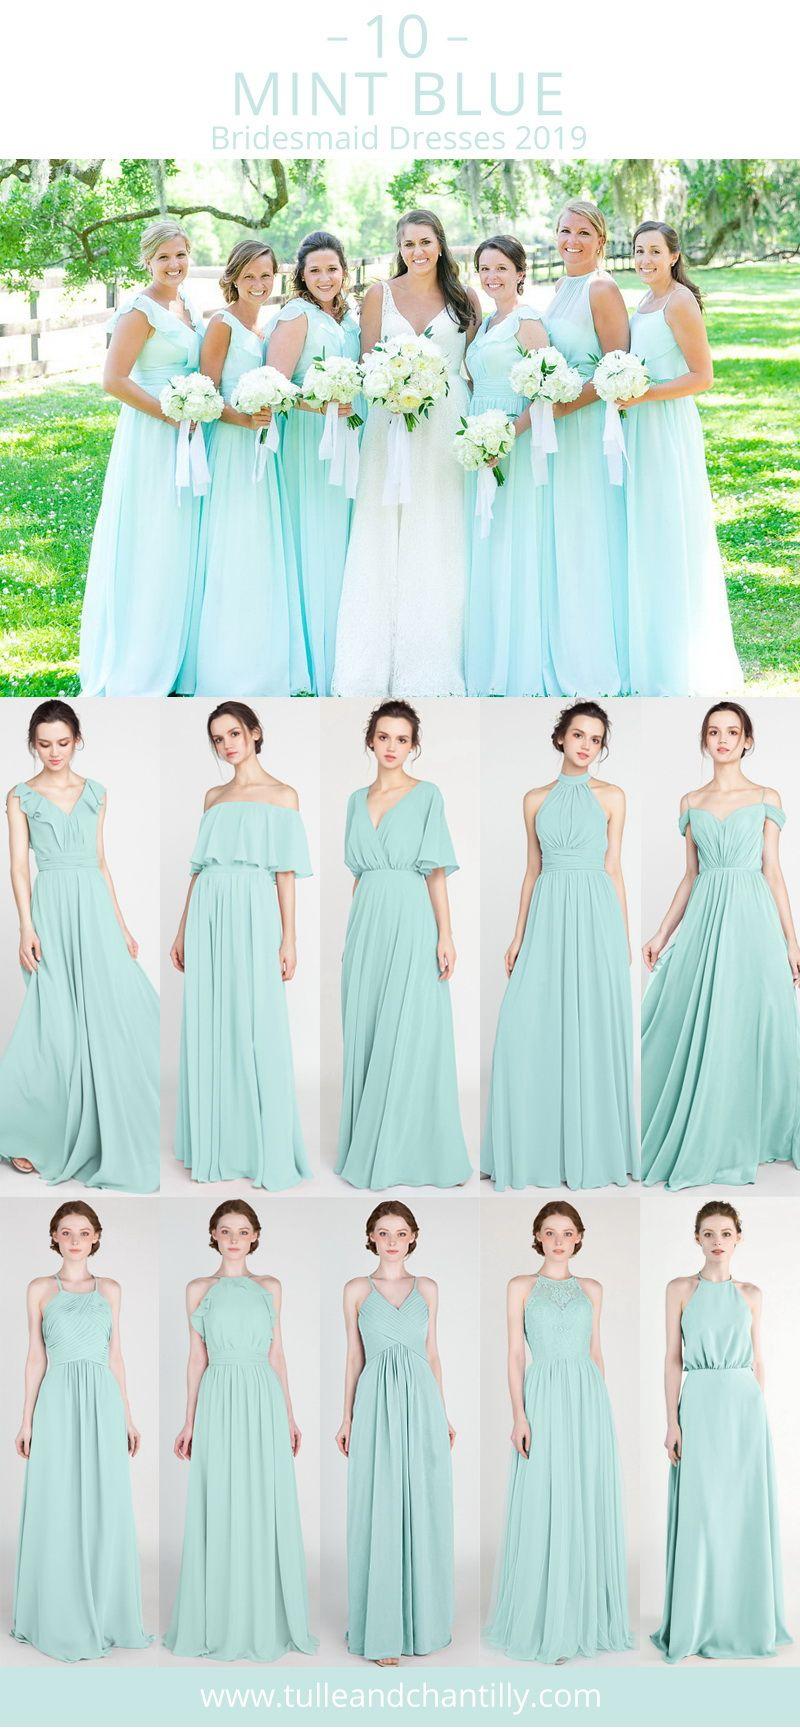 Top 10 Mint Blue Bridesmaid Dresses For Wedding Season 2019 Wedding Weddingin Mint Green Bridesmaid Dresses Mint Bridesmaid Dresses Summer Bridesmaid Dresses